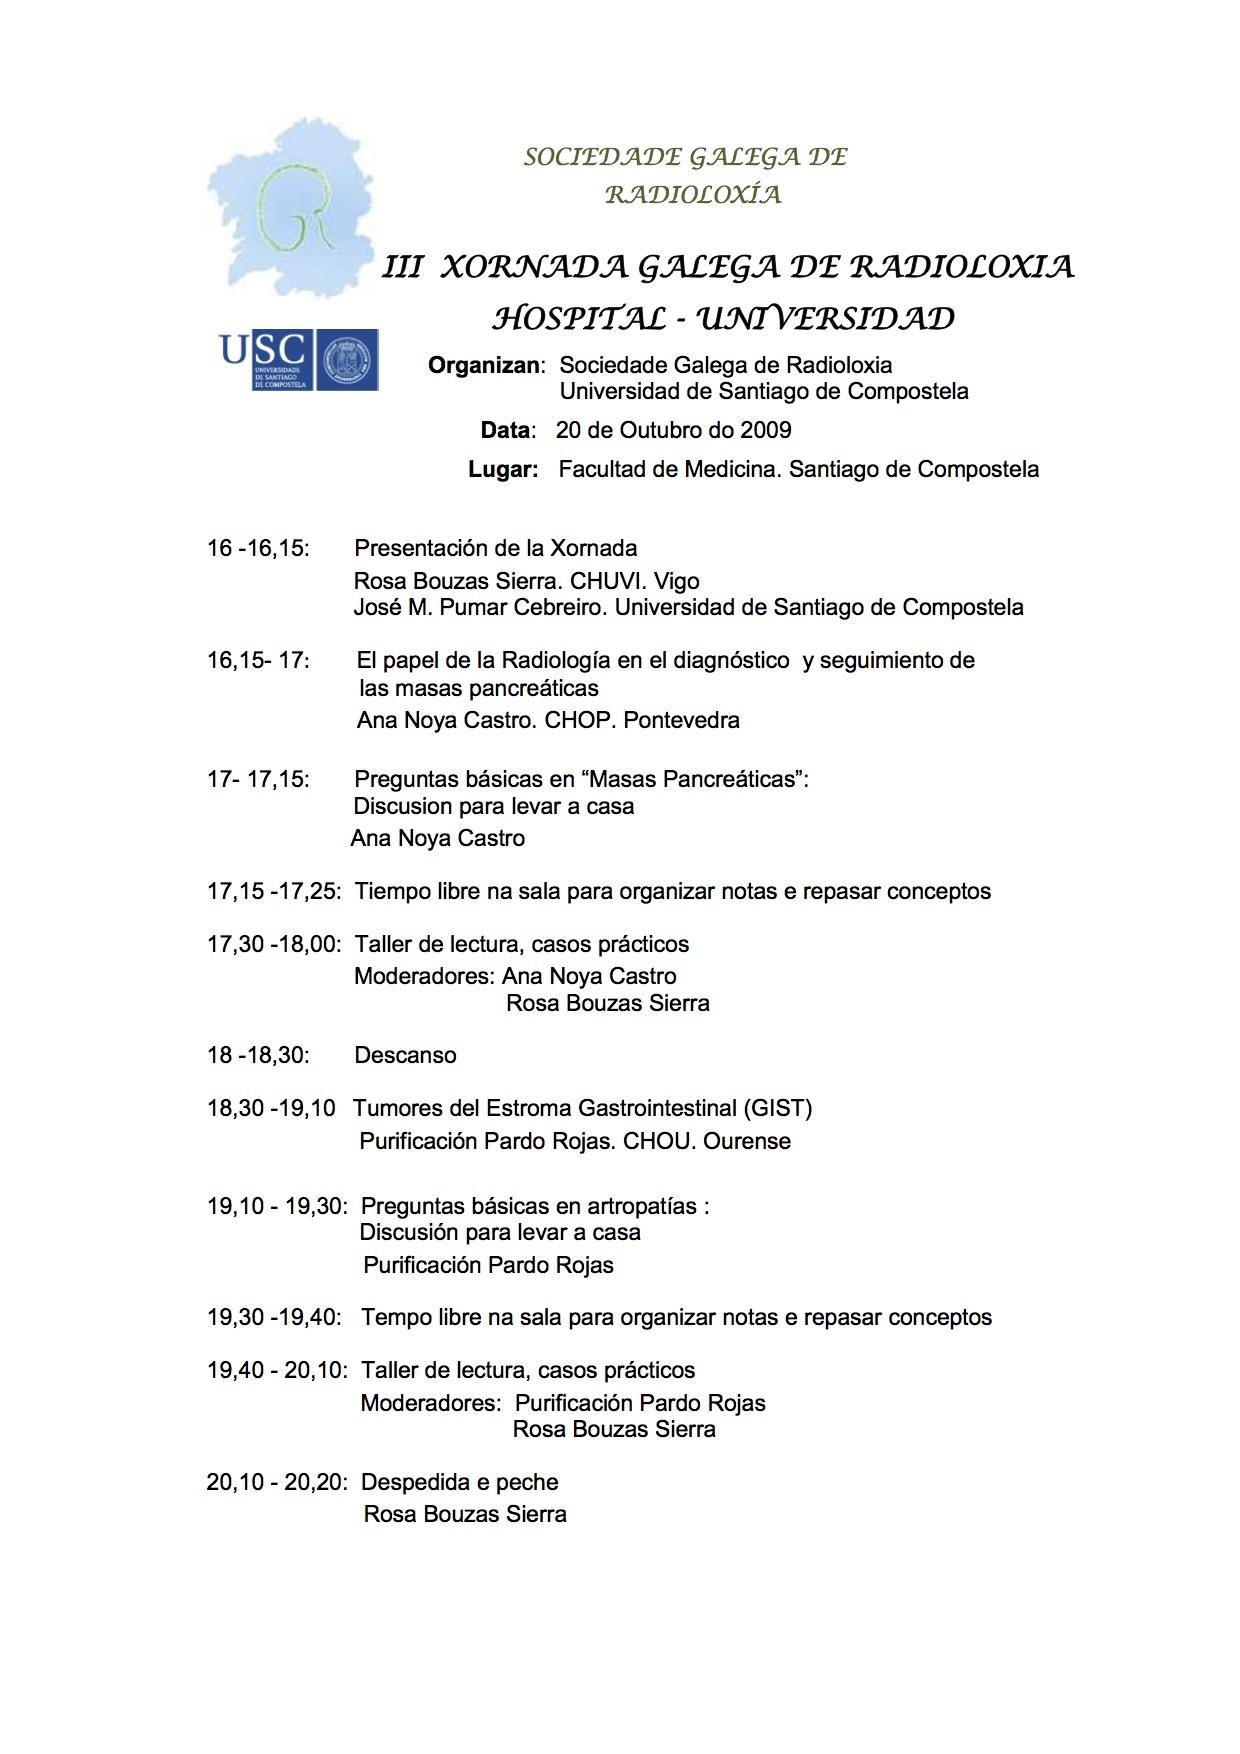 2009-10-20-iii-jornada-sgr-hospital-universidad-programa